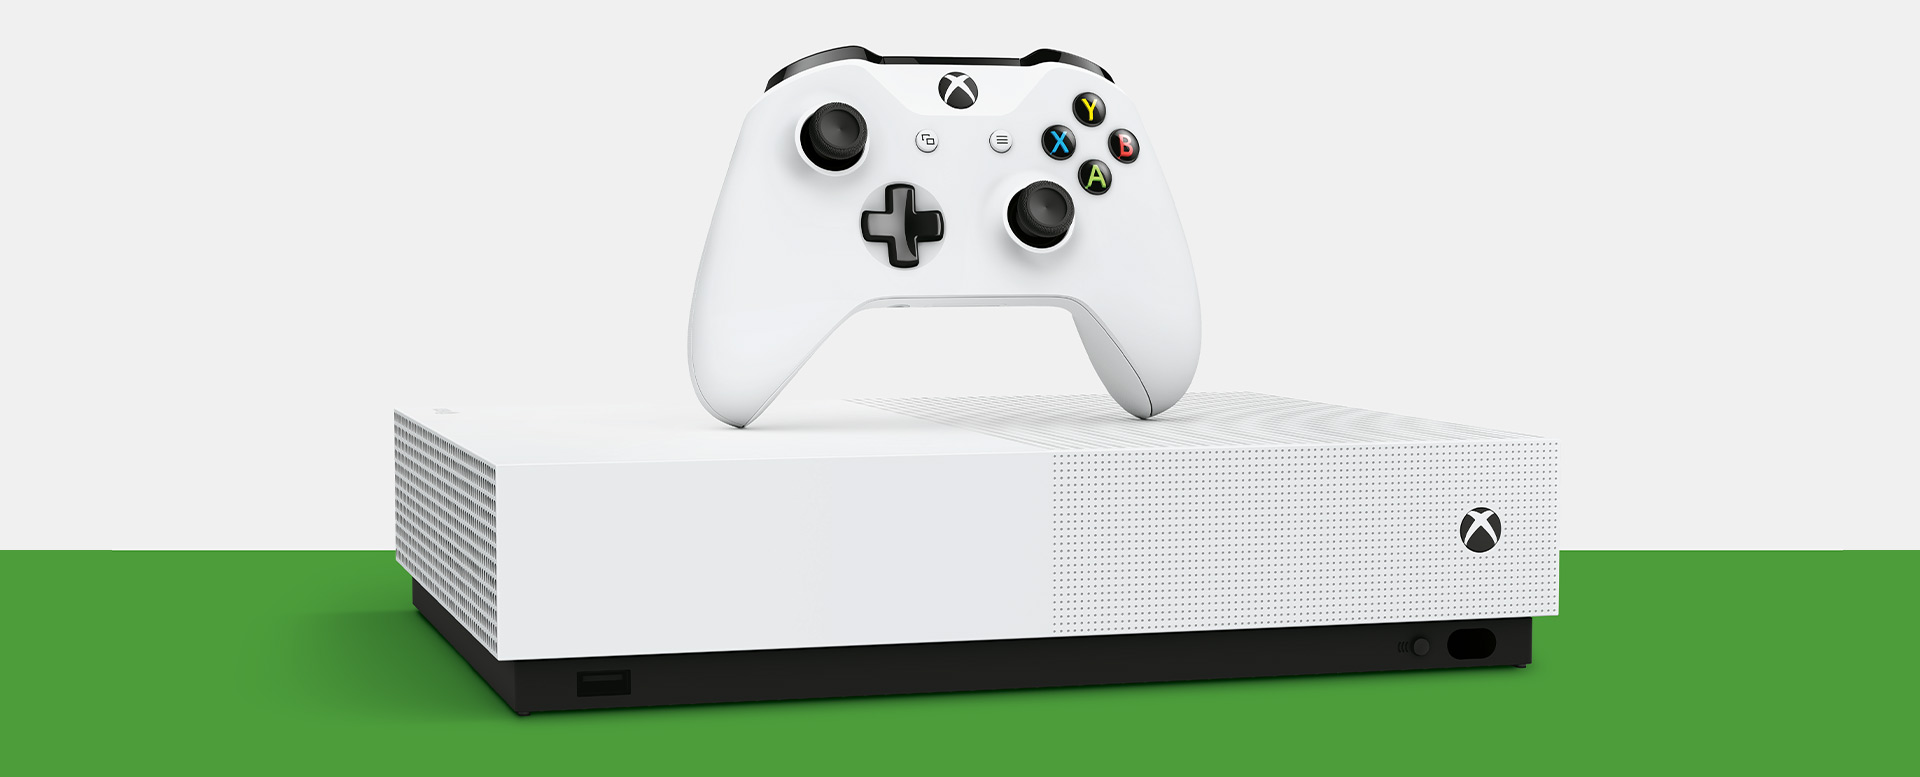 ya-esta-en-el-mercado-la-xbox-one-s-all-digital-edition-frikigamers.com